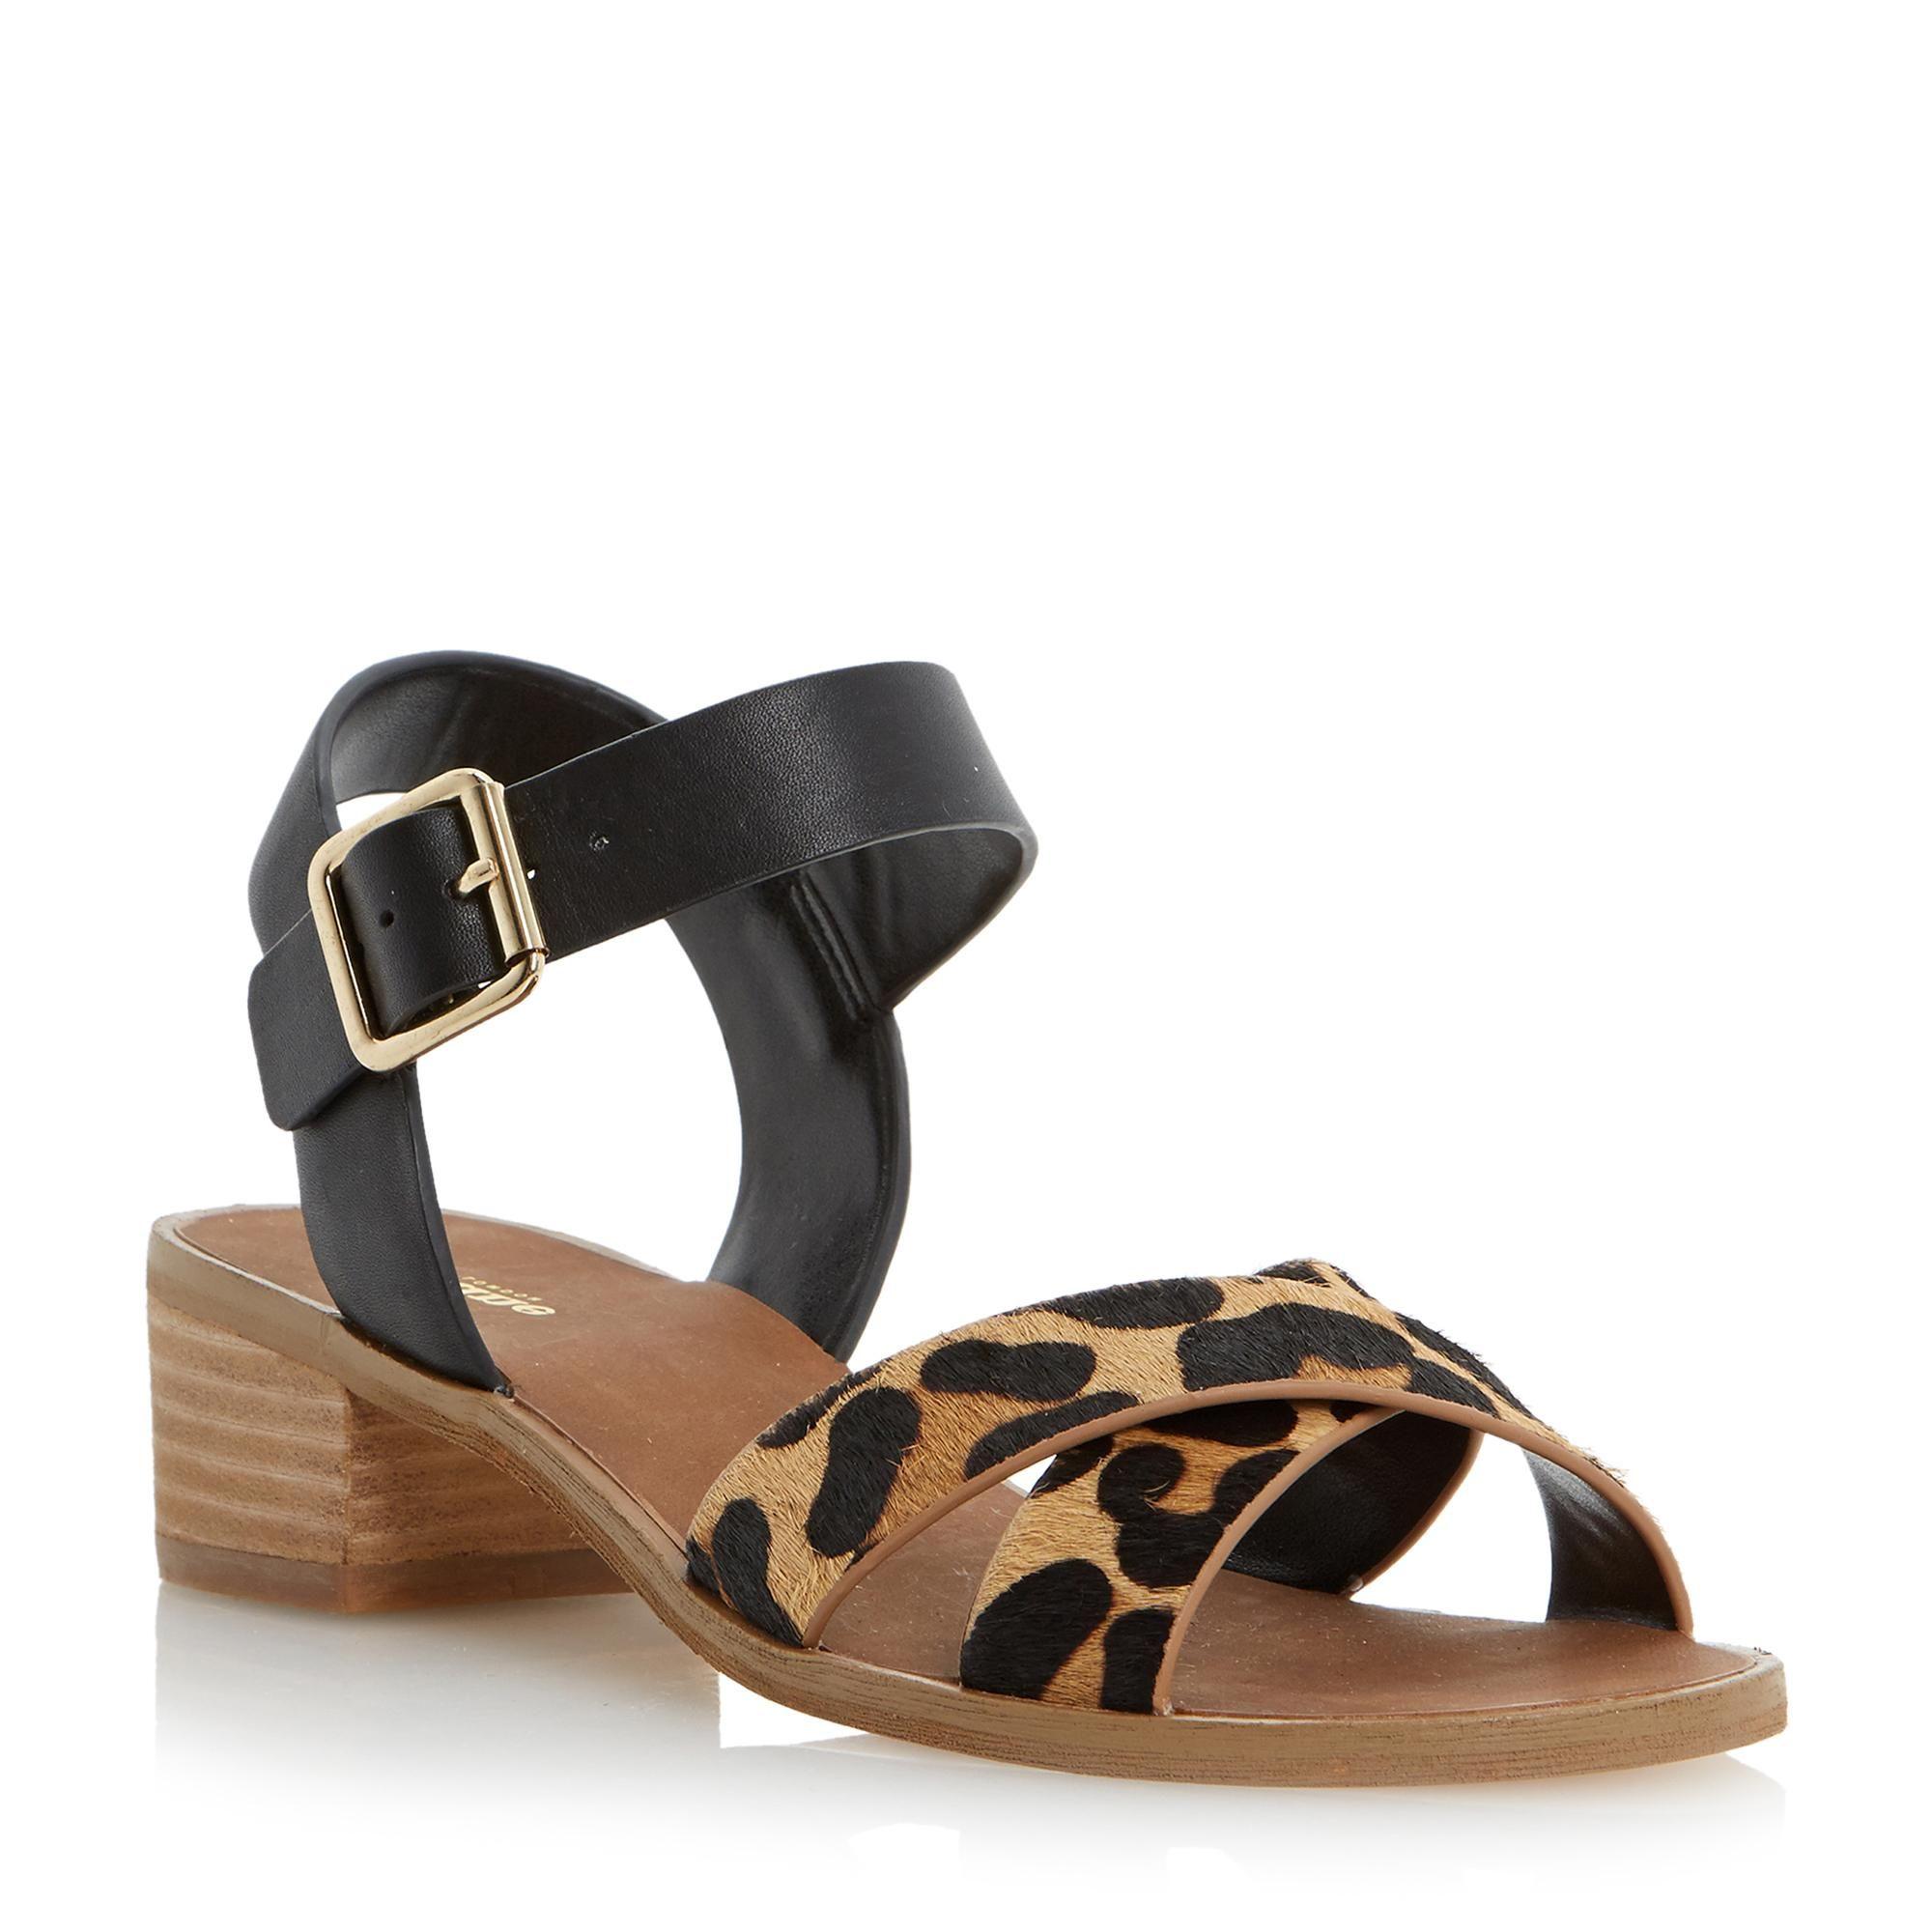 Black sandals online - Dune Ladies Jotta Contrast Crossover Strap Low Block Heel Sandal Black Dune Shoes